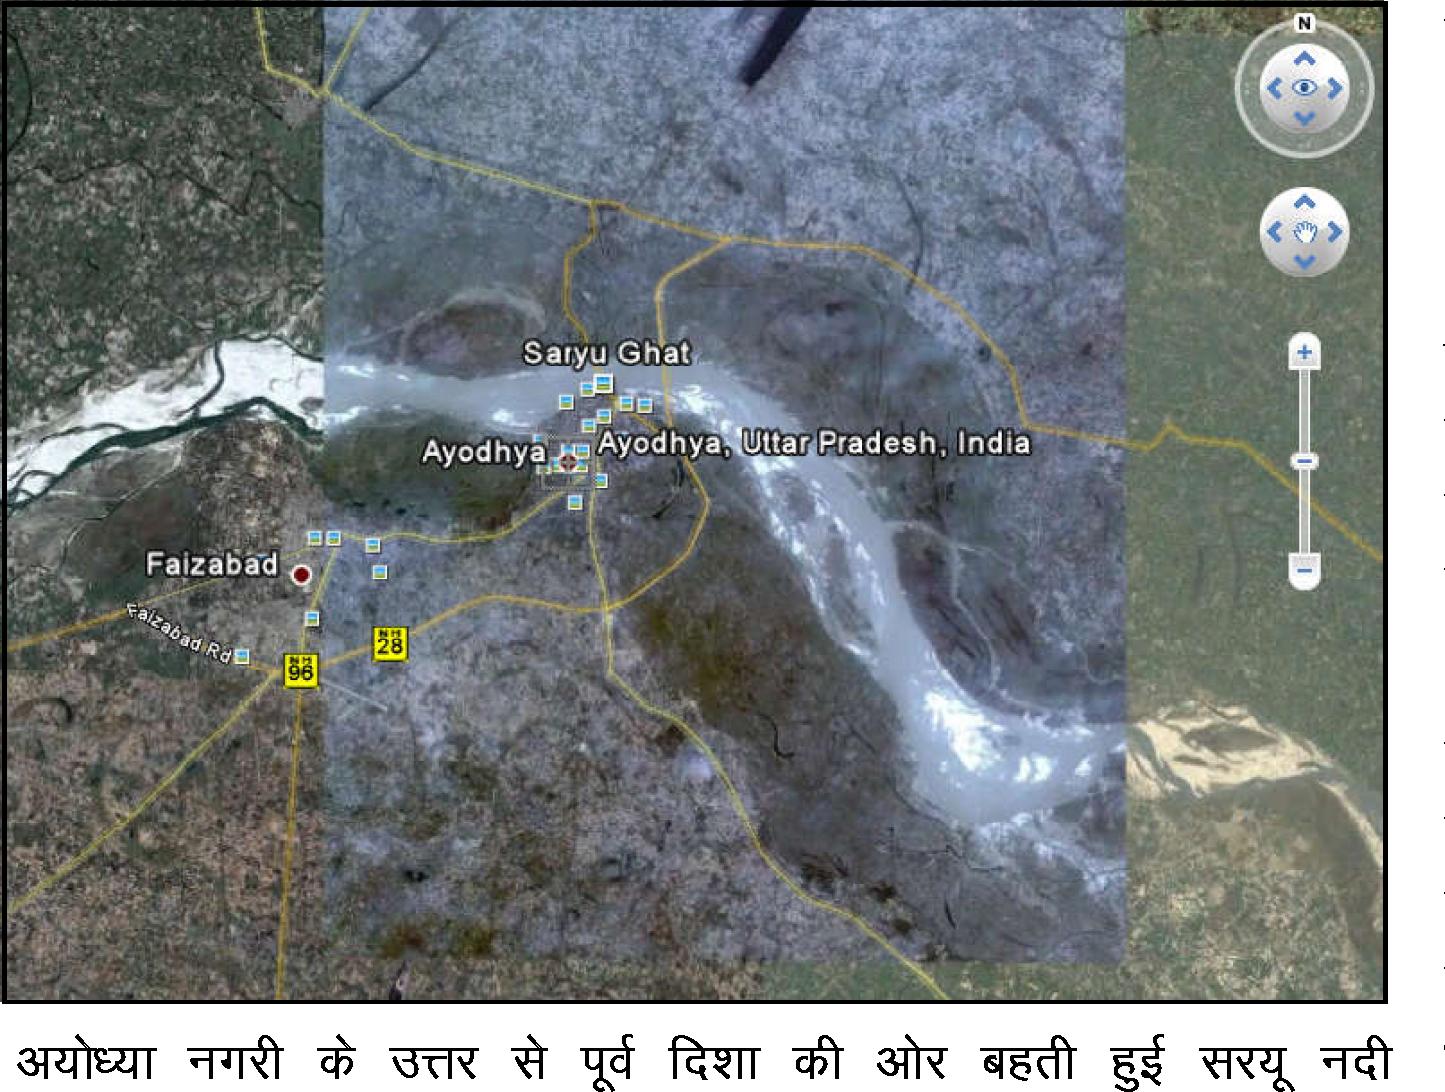 Ayodhya Ram janam Bhoomi, ayodhya verdict, ram janmabhoomi ayodhya, Vastu Kuldeep Saluja, Ram Janmabhoomi dispute, Vastu Connection with ayodhya